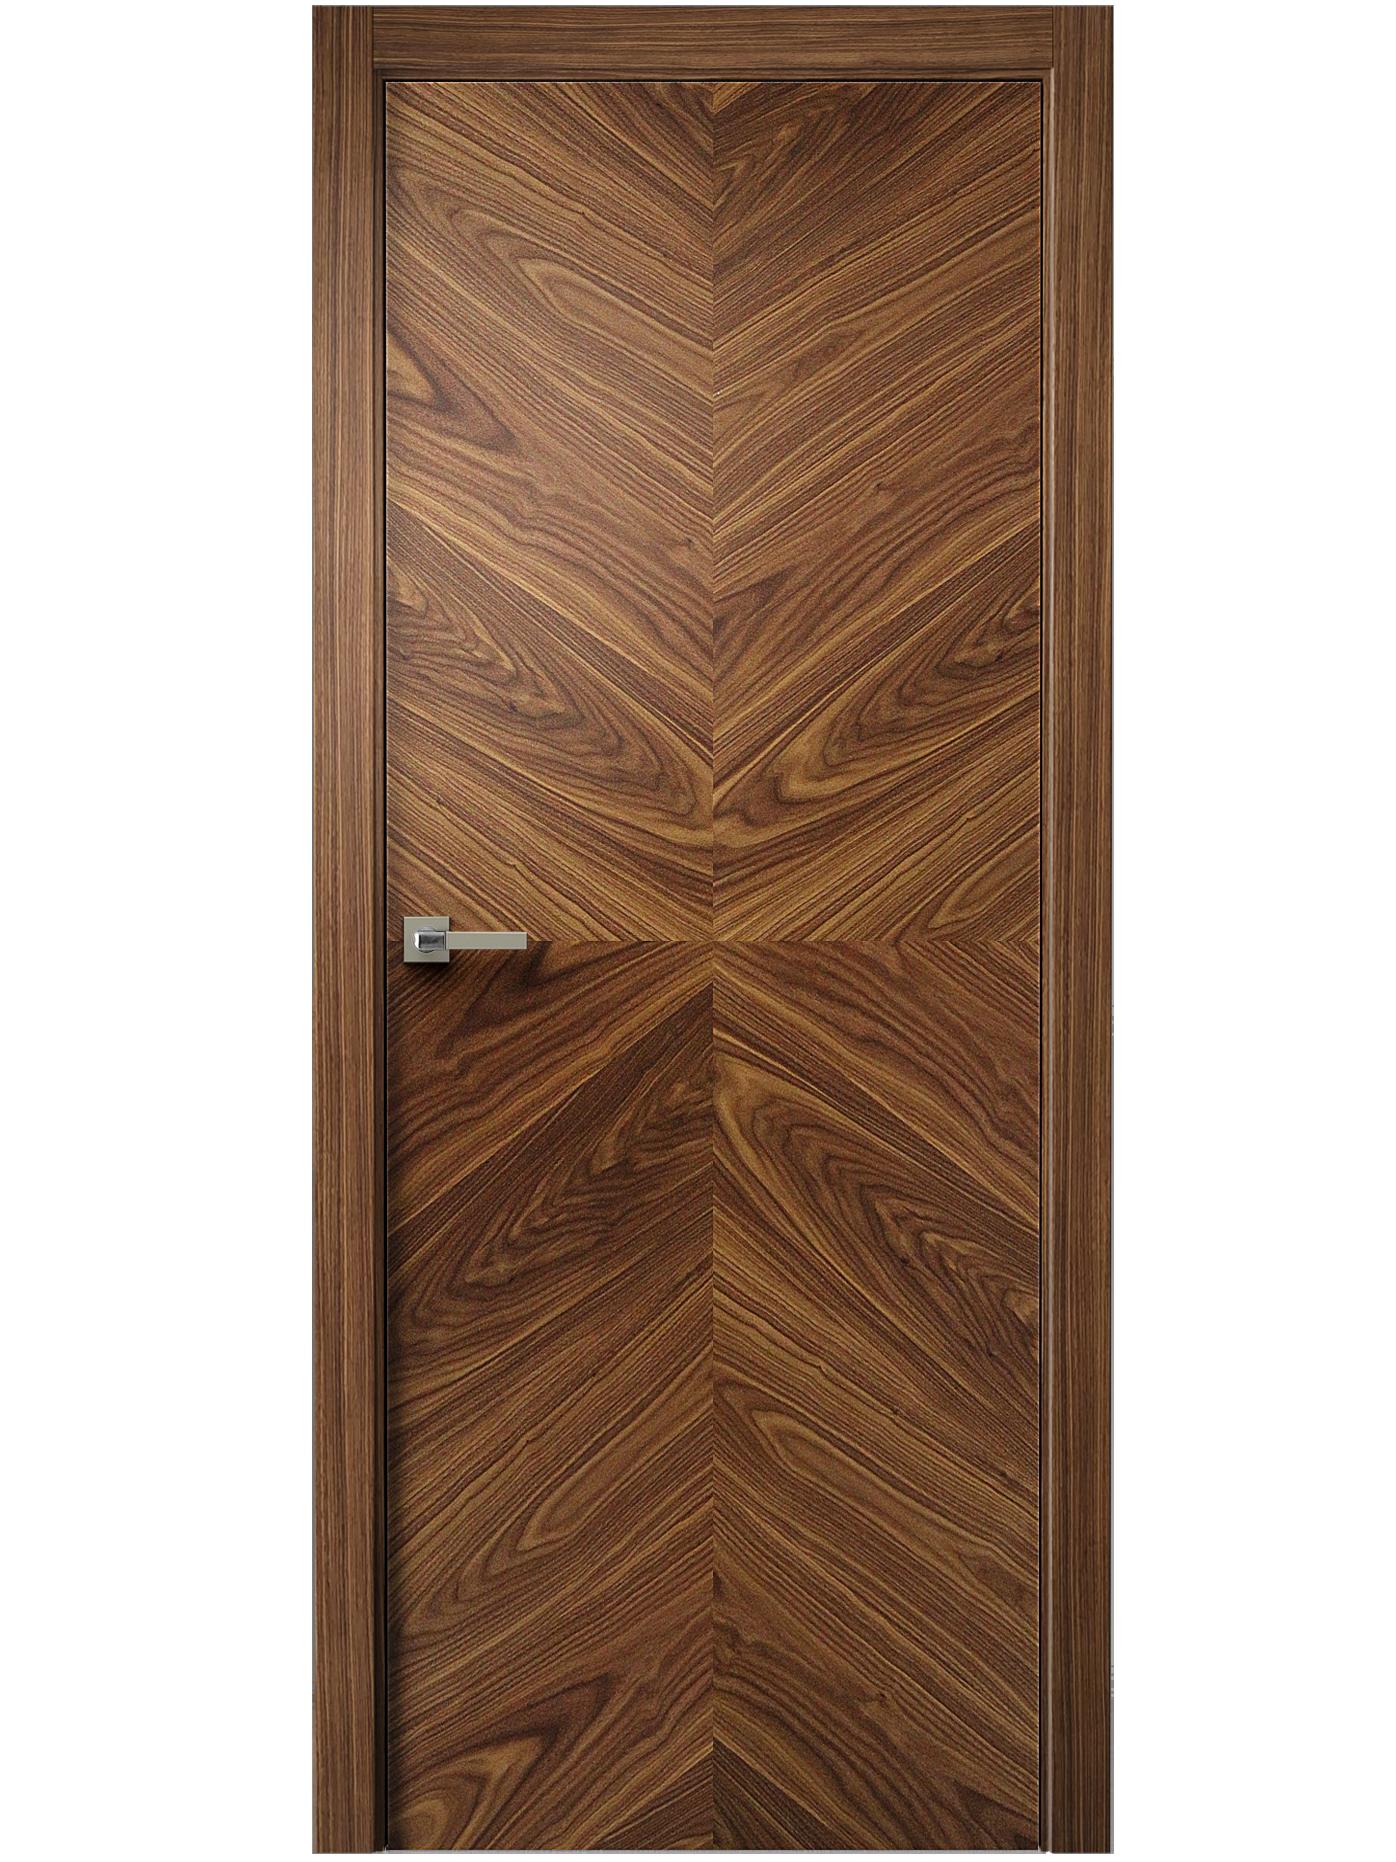 Image Tera X Interior Door American Walnut 0